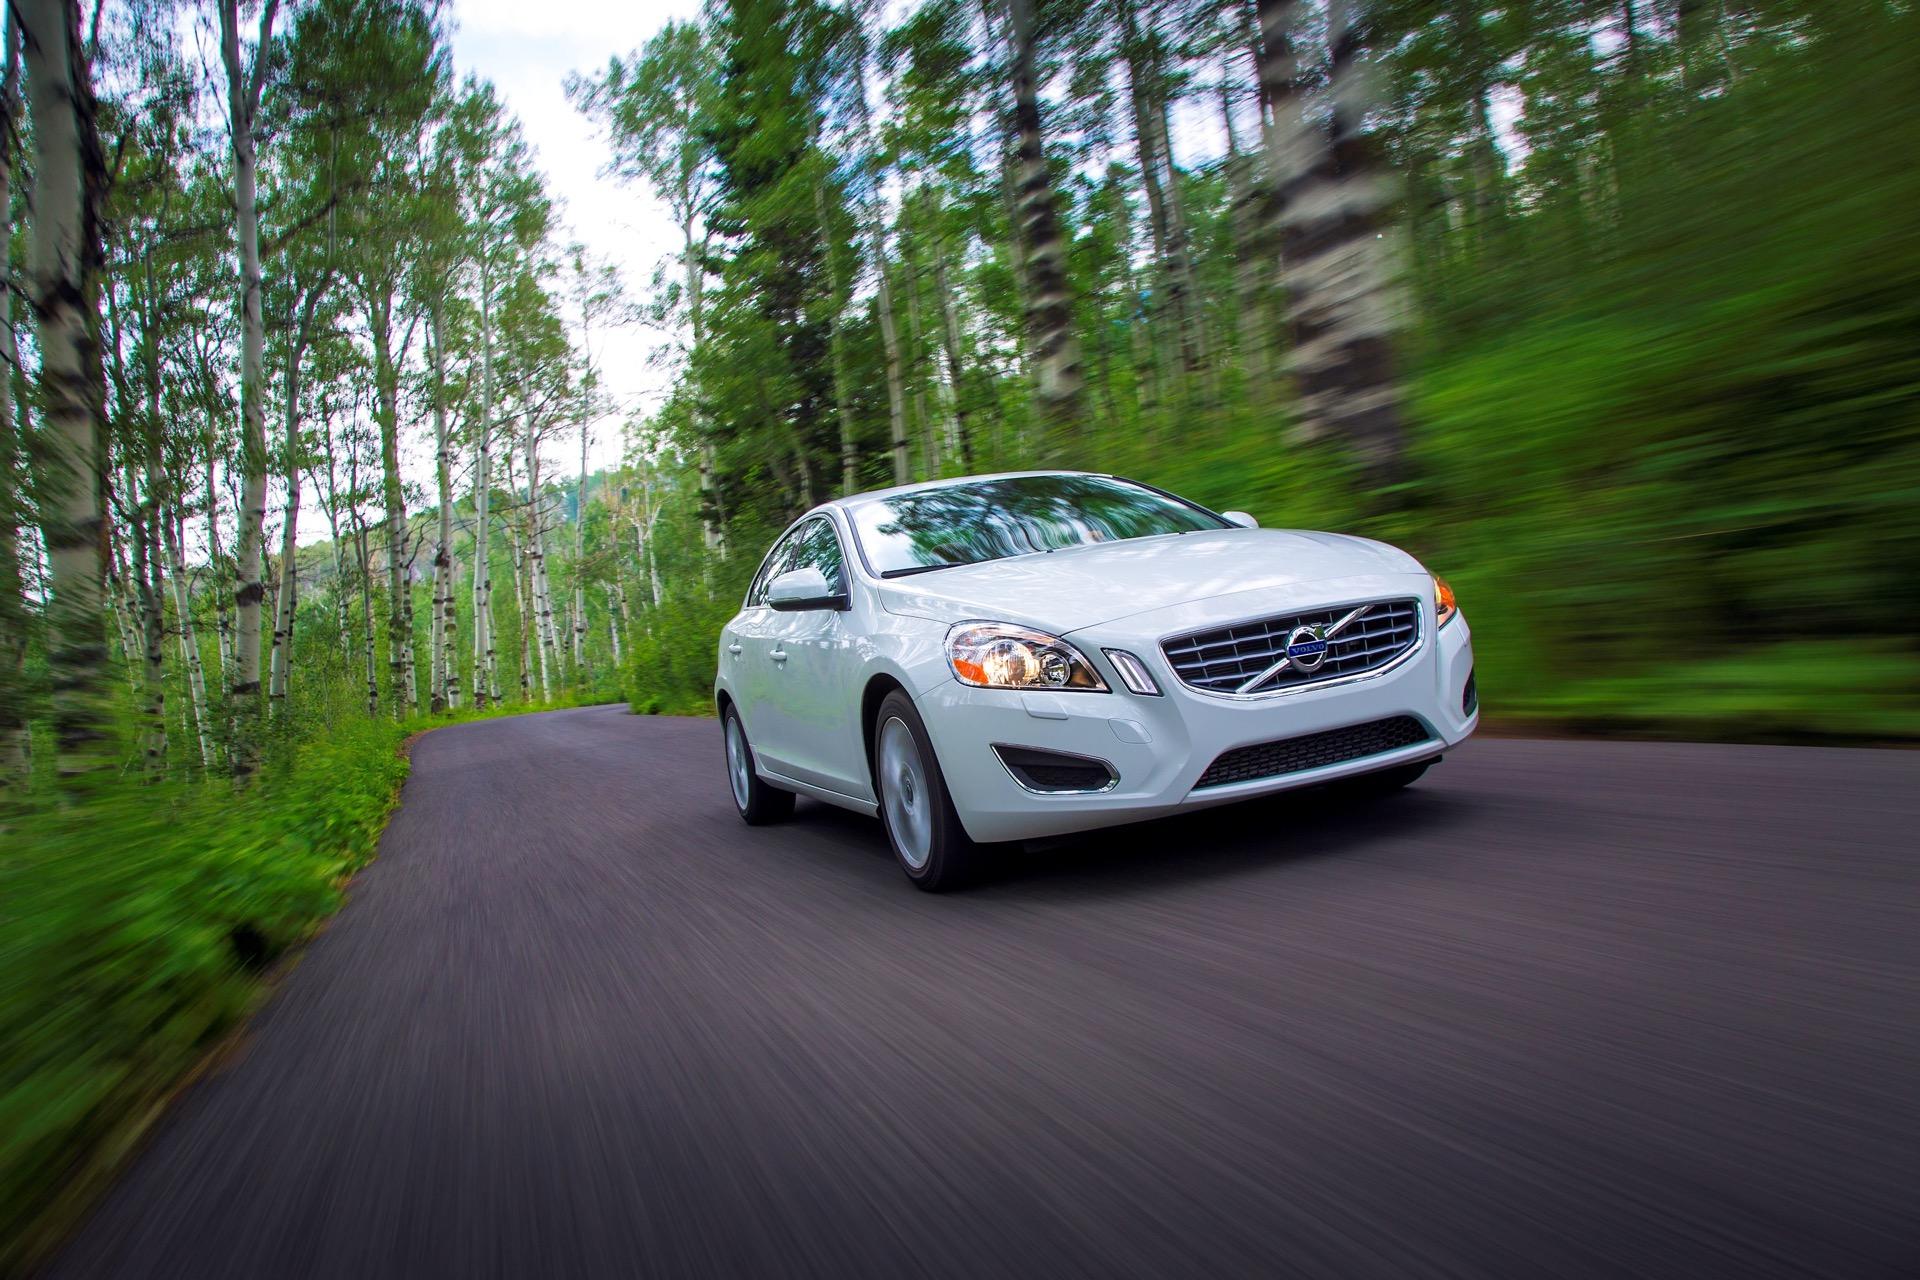 S60 T5 Awd27 -  Volvo